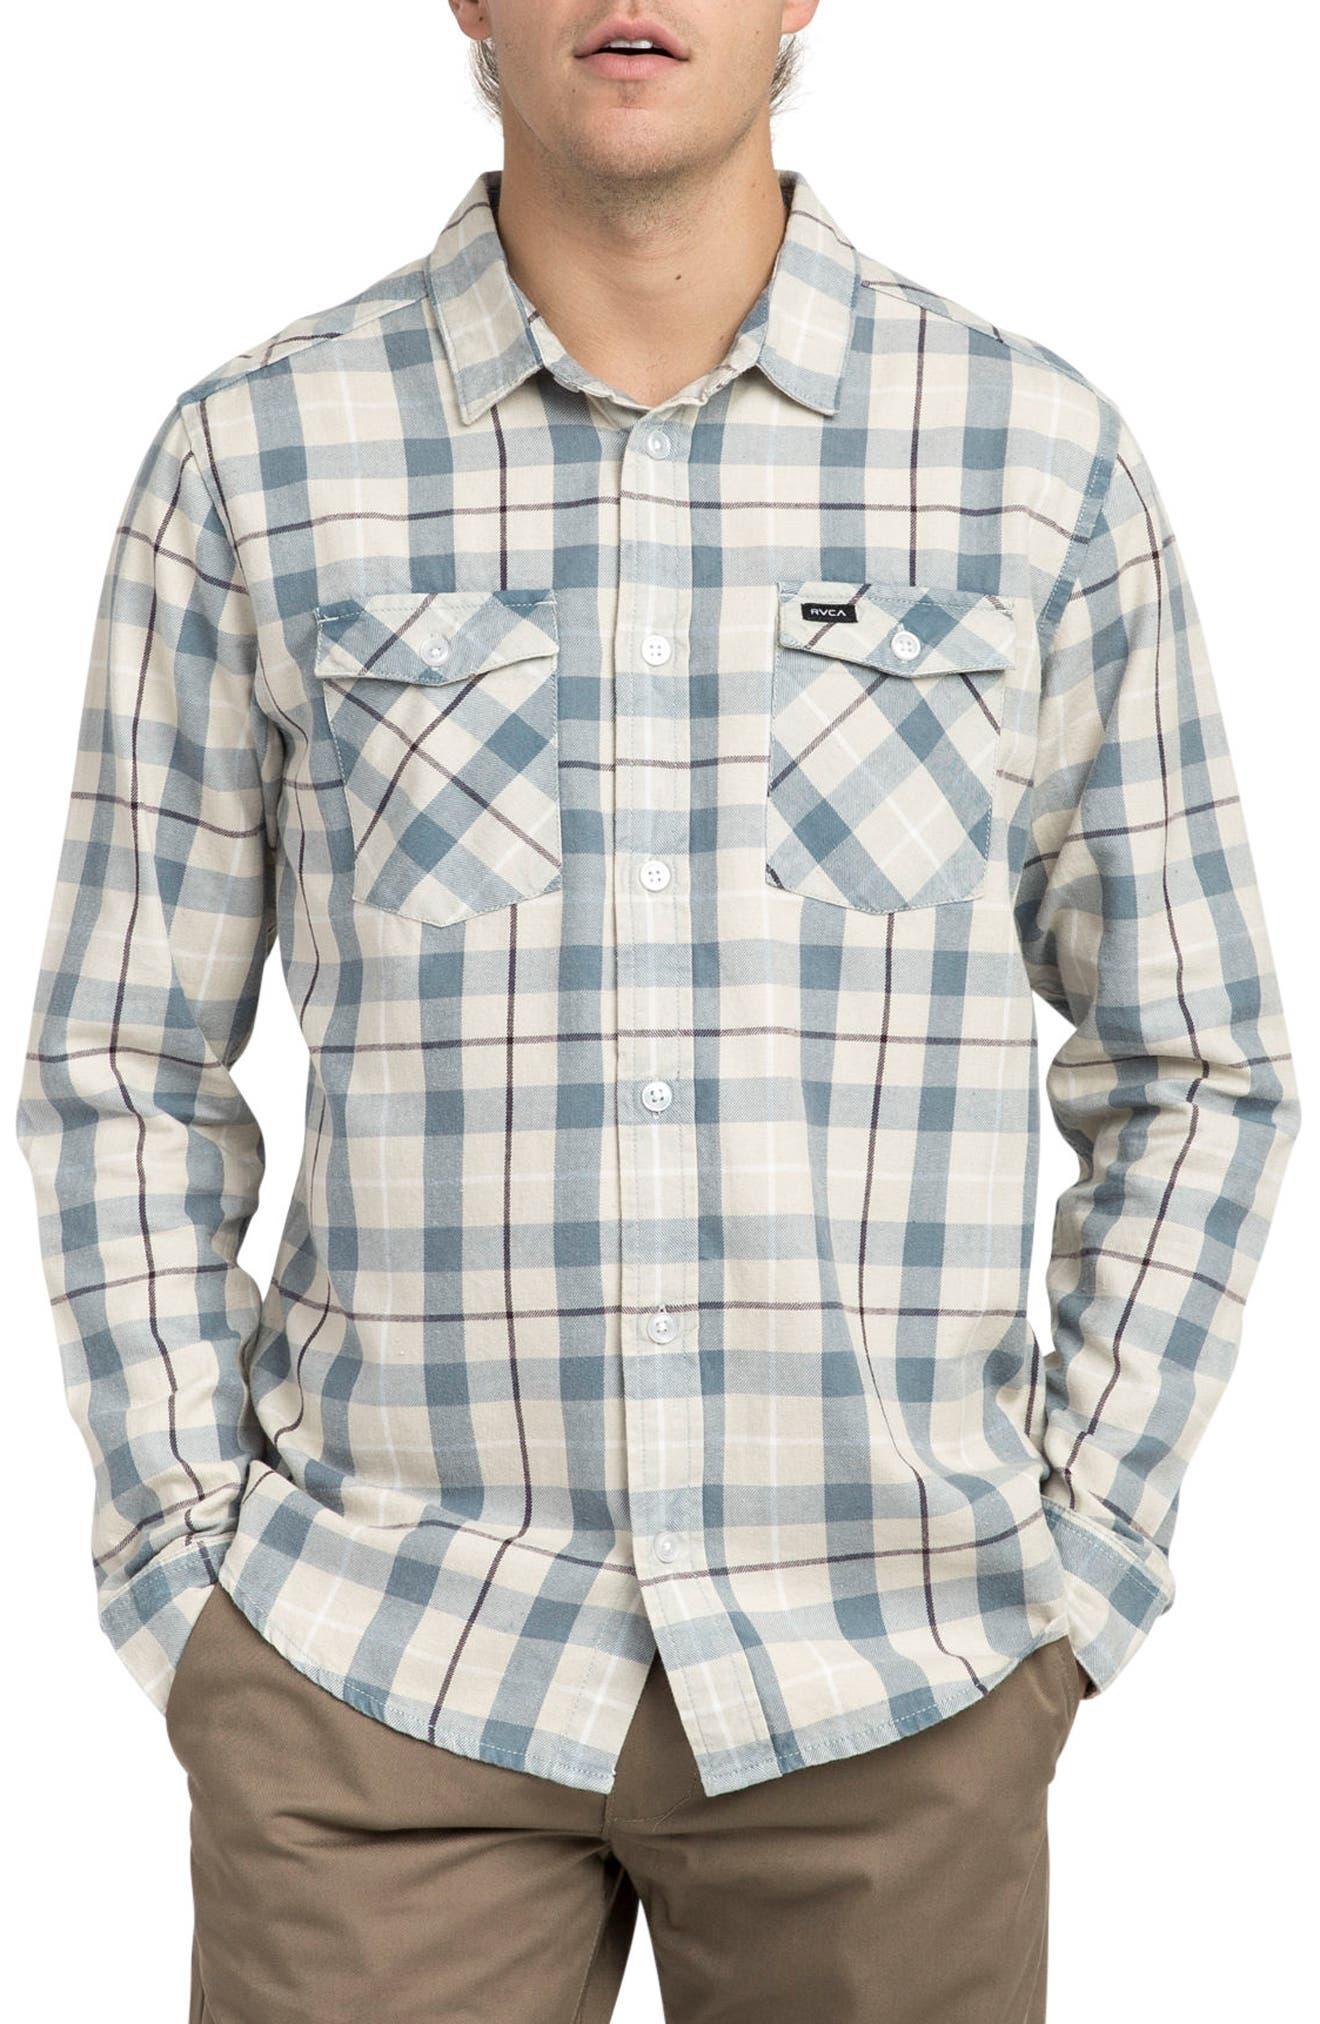 Treets Plaid Flannel Shirt,                             Main thumbnail 1, color,                             020